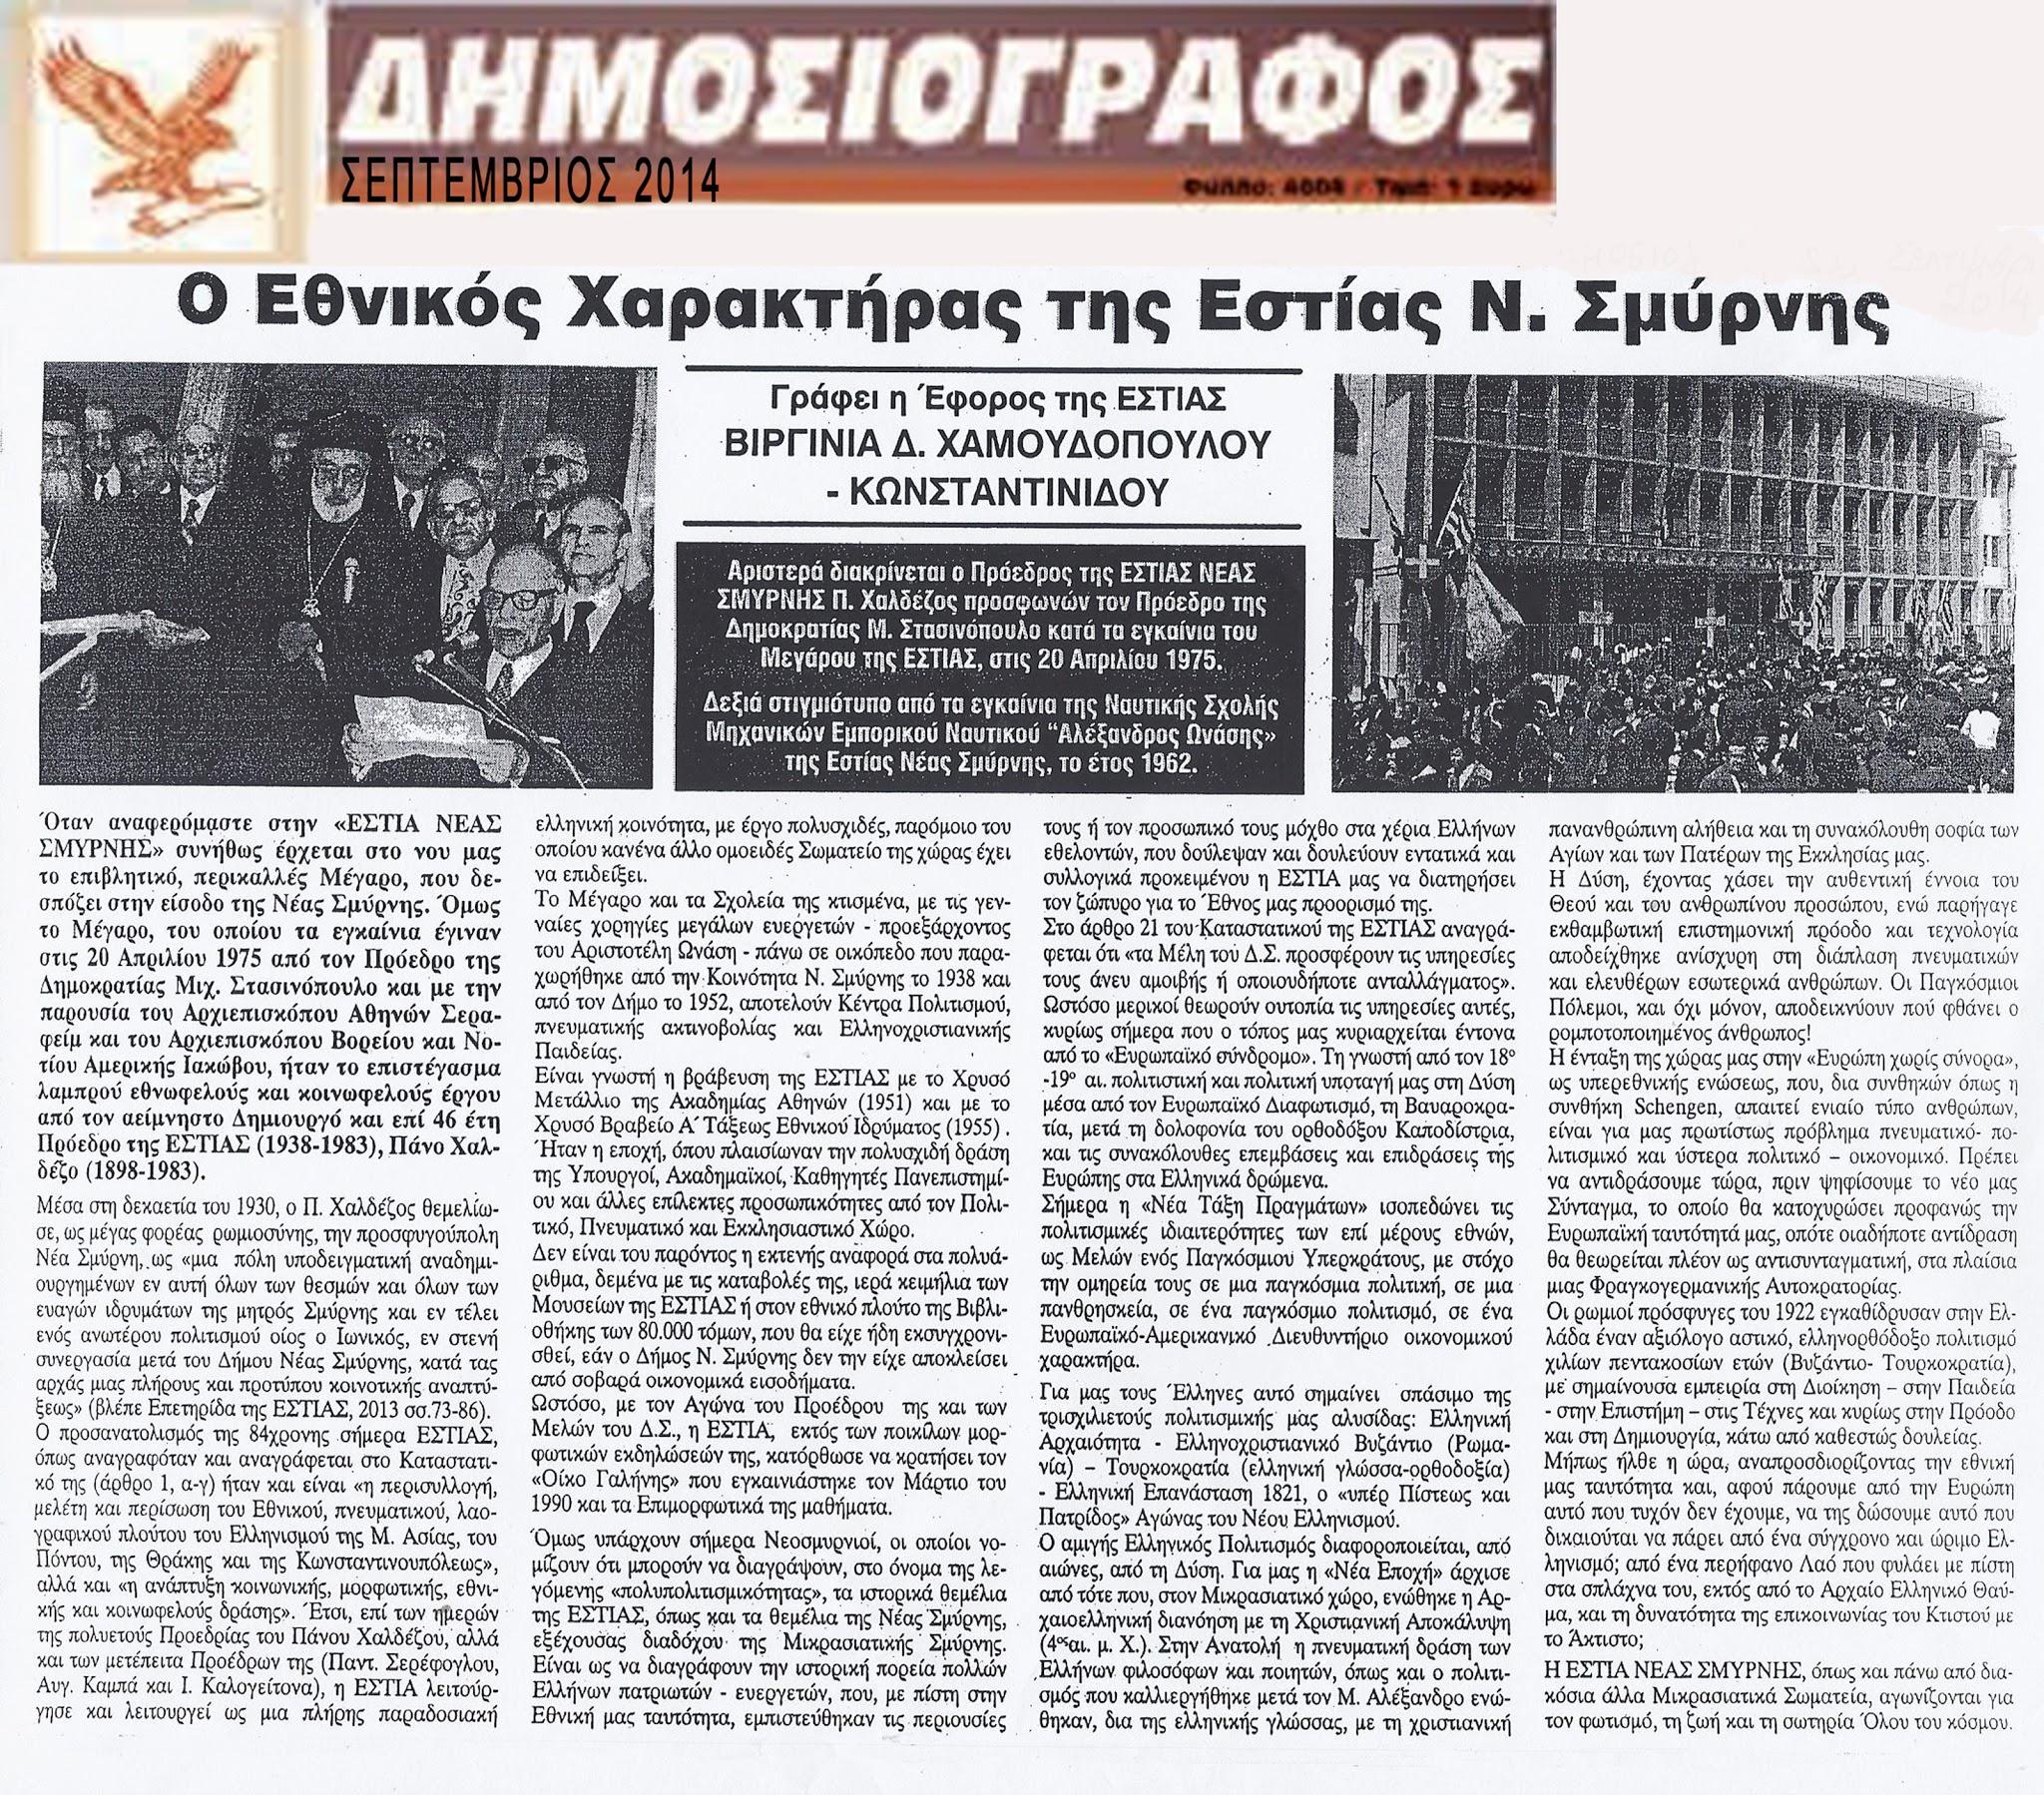 Photo: ΔΗΜΟΣΙΟΓΡΑΦΟΣ: «Ο Εθνικός Χαρακτήρας της Εστίας Ν. Σμύρνης, Γράφει η Έφορος της Εστίας ΒΙΡΓΙΝΙΑ Δ. ΧΑΜΟΥΔΟΠΟΥΛΟΥ-ΚΩΝΣΤΑΝΤΙΝΙΔΟΥ», Σεπτέμβριος 2014.